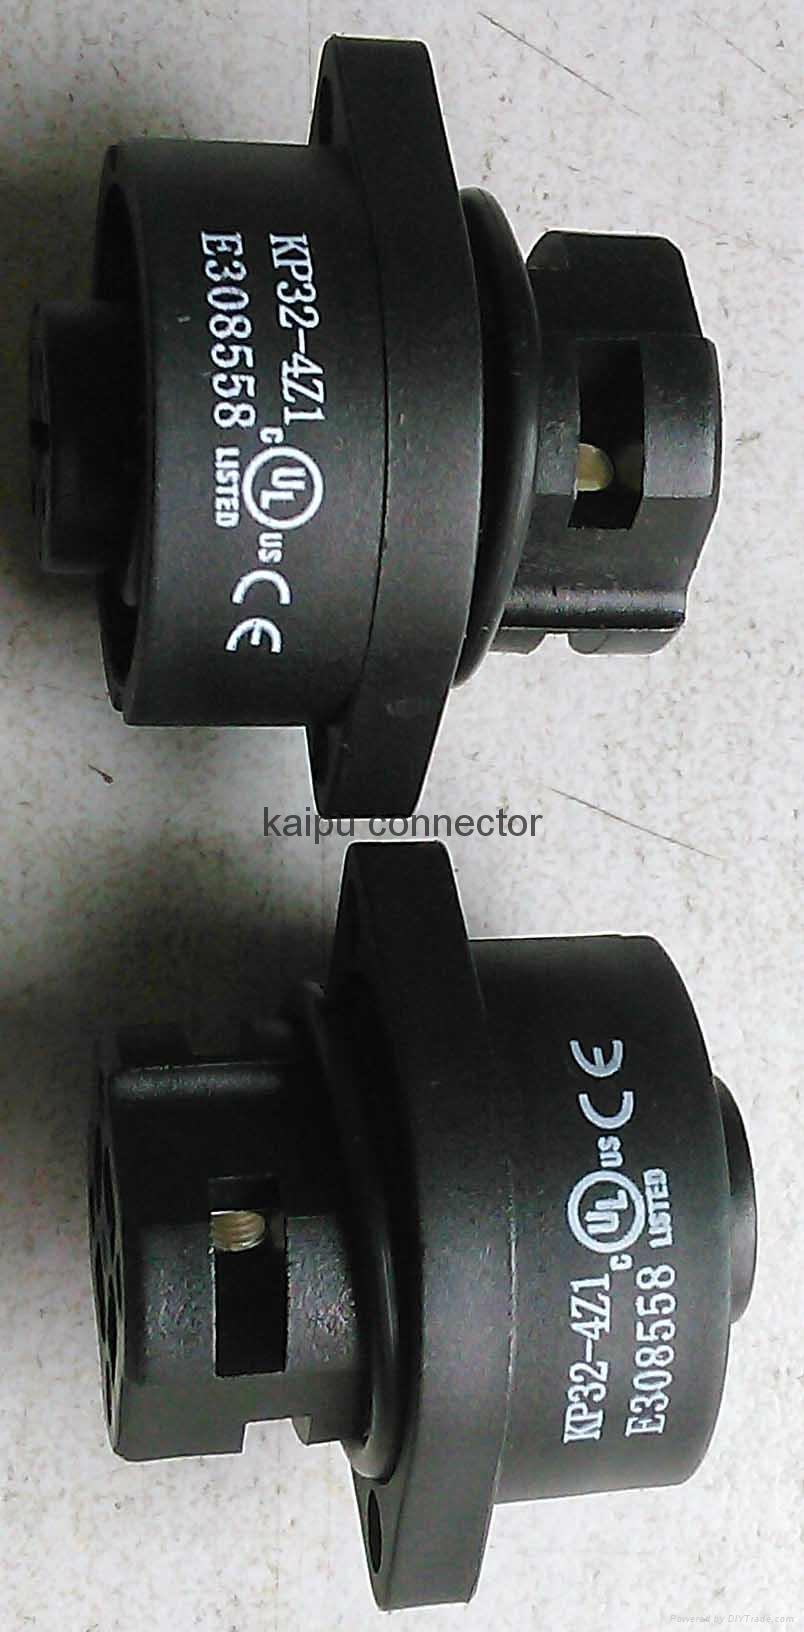 UL认证的KP32型防水电连接器 3